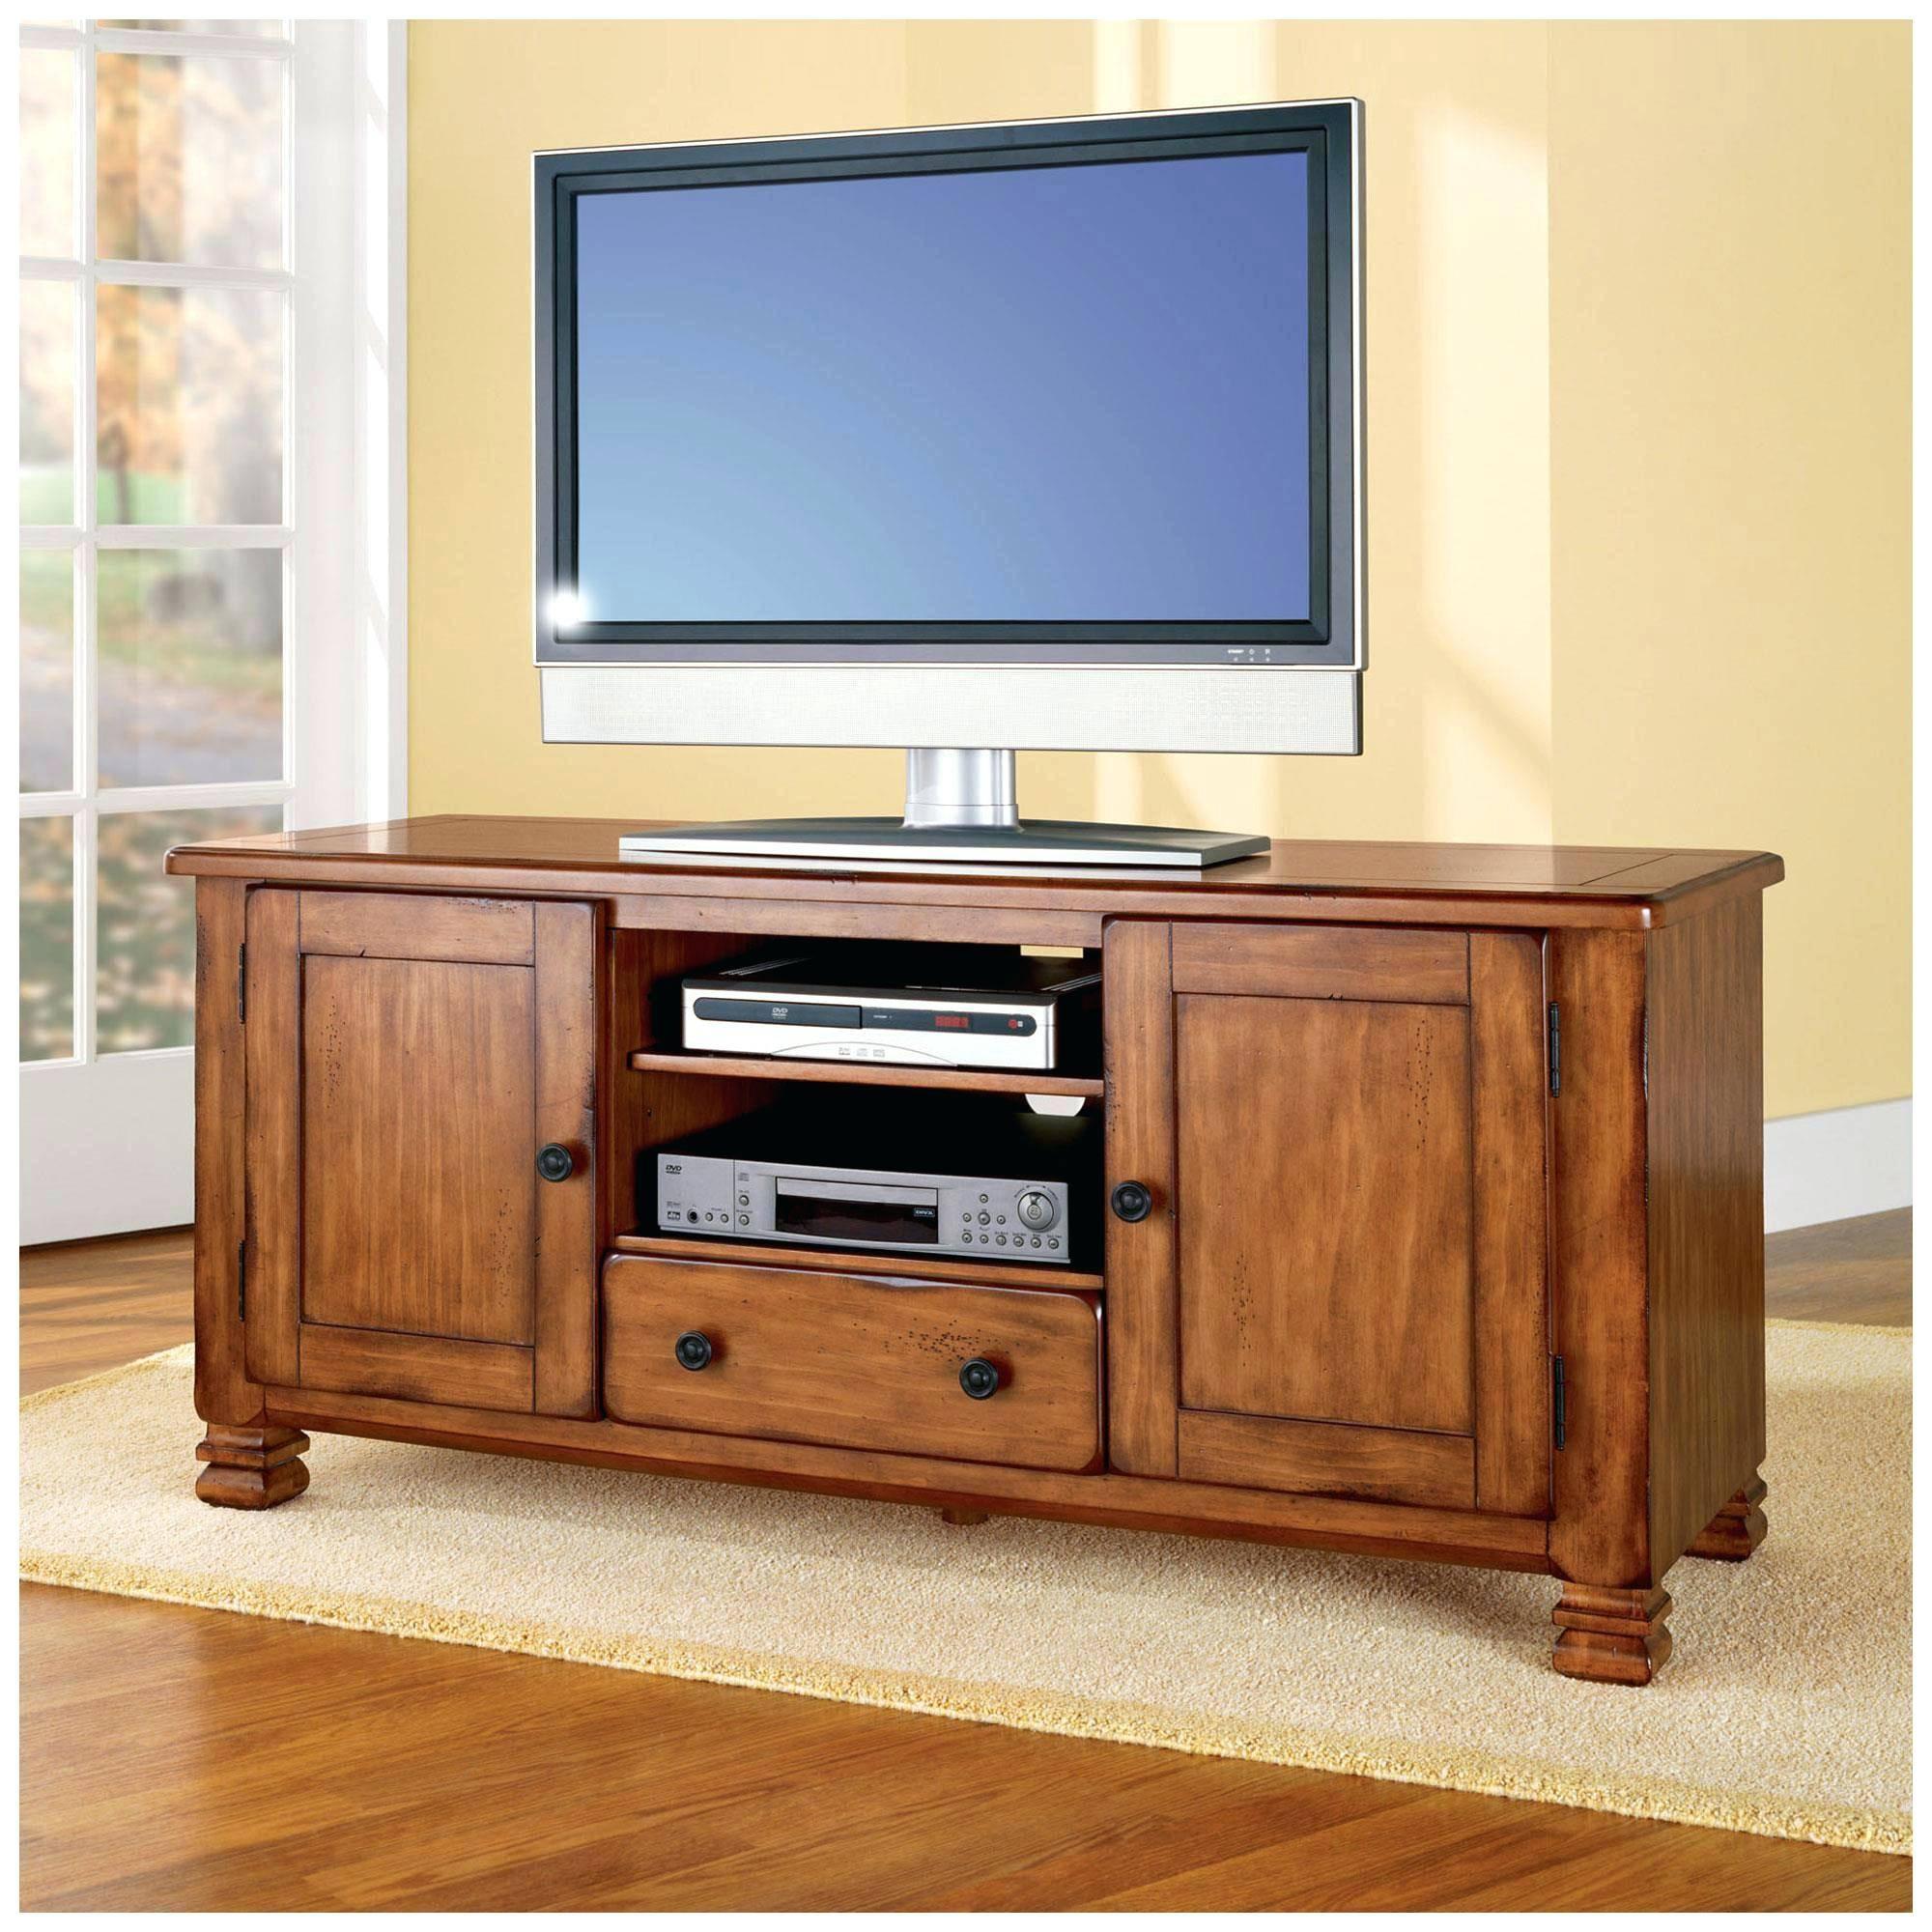 Tv Stand Furniture Ideas 76 Ergonomic Large Size Of Inside Corner Oak Stands